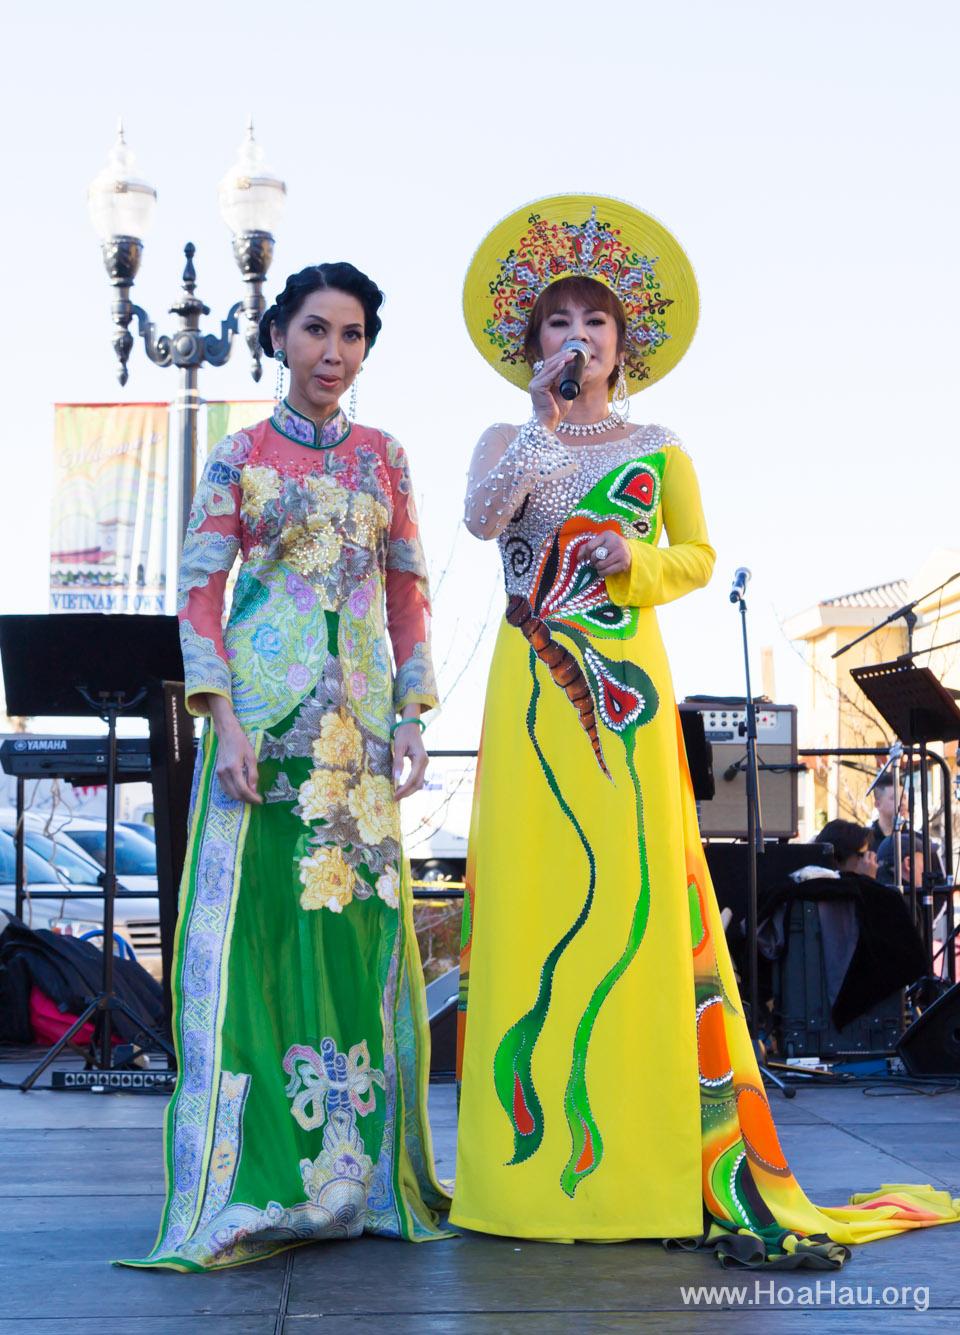 Tet Festival 2014 at Vietnam Town - Hoa Hau - Miss Vietnam - Image 172